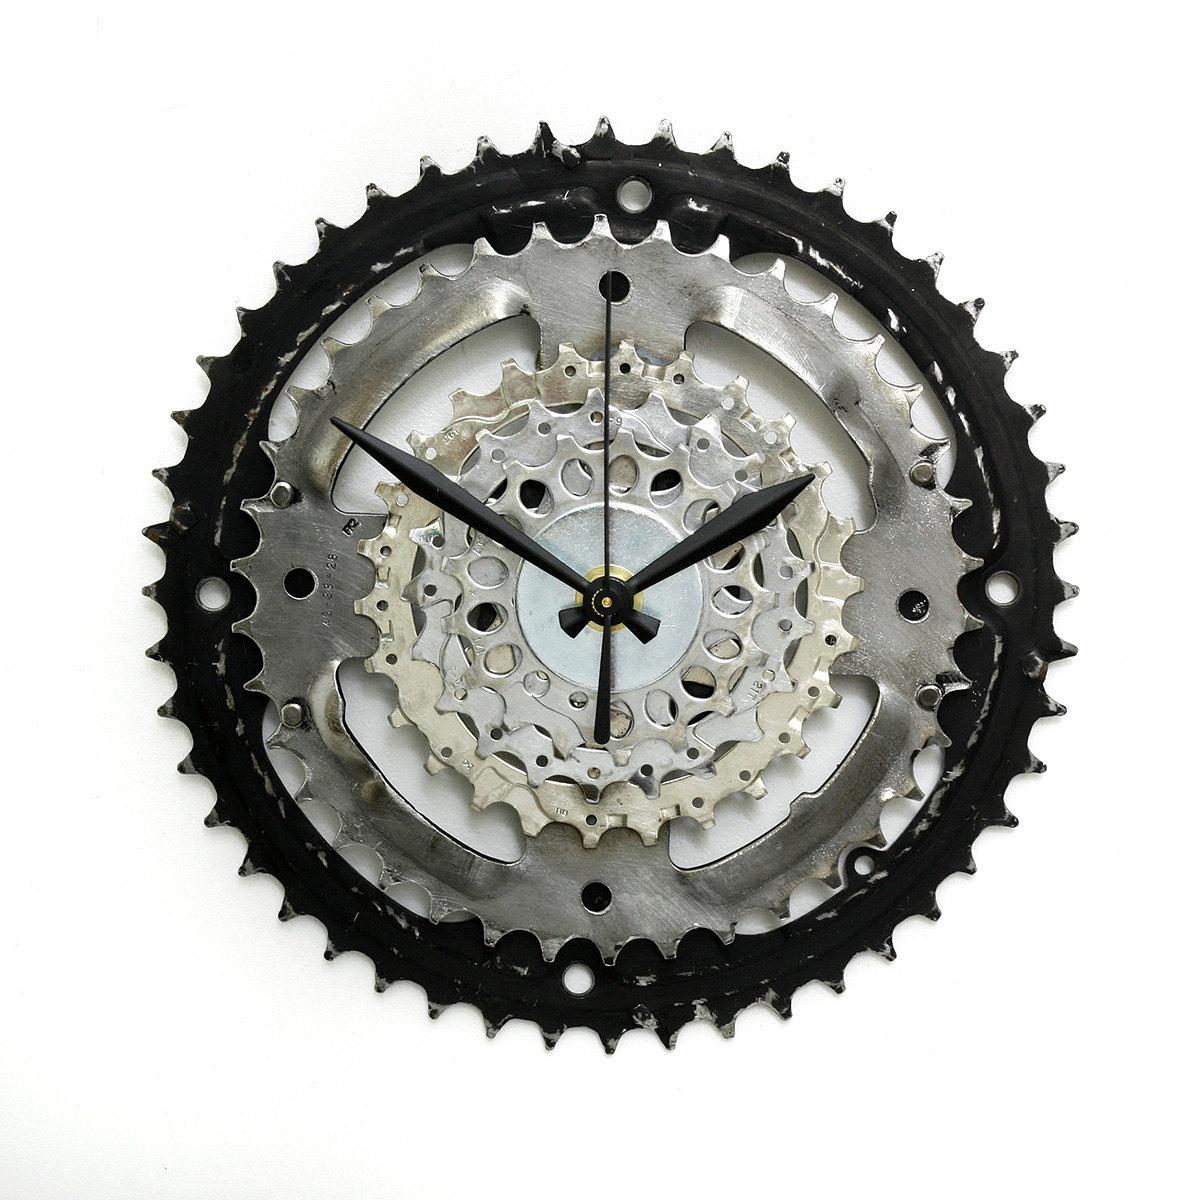 Steampunk Wall Clock Steampunk Decor Gift For Him Bike Gear